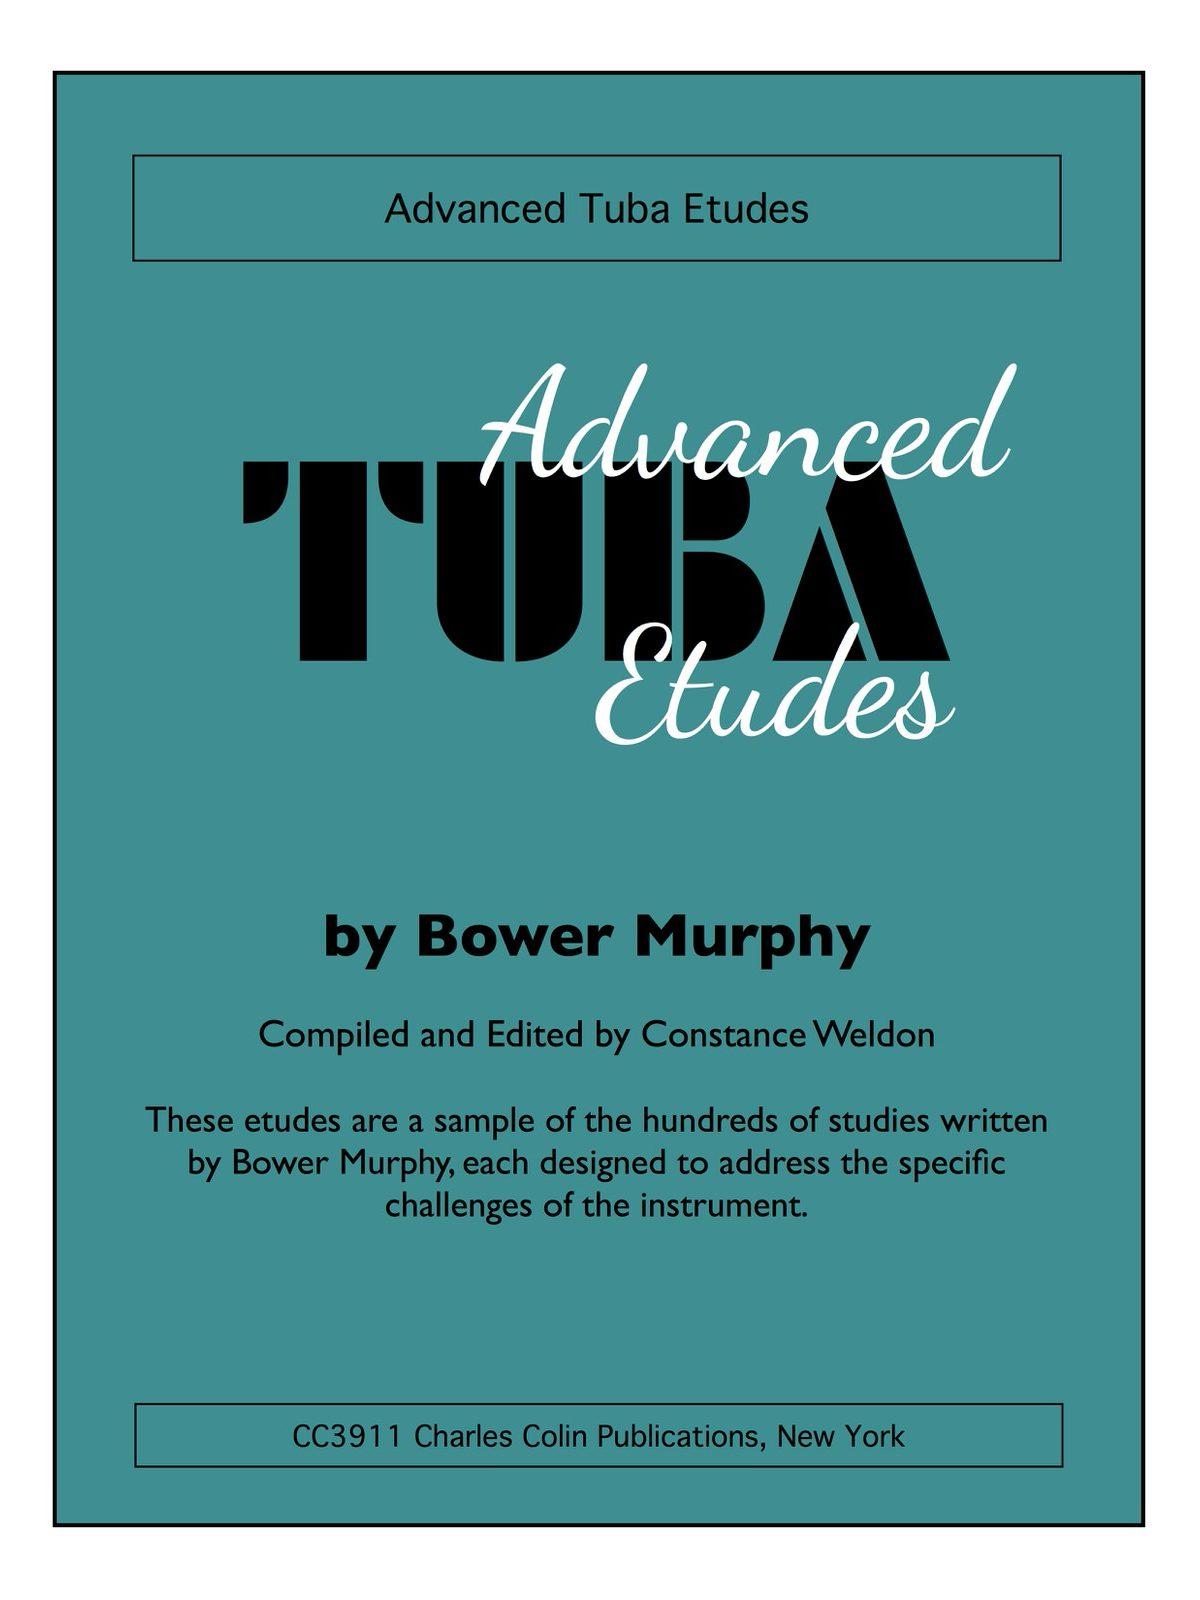 Bower-Murphy, Advanced Tuba Etudes-p01